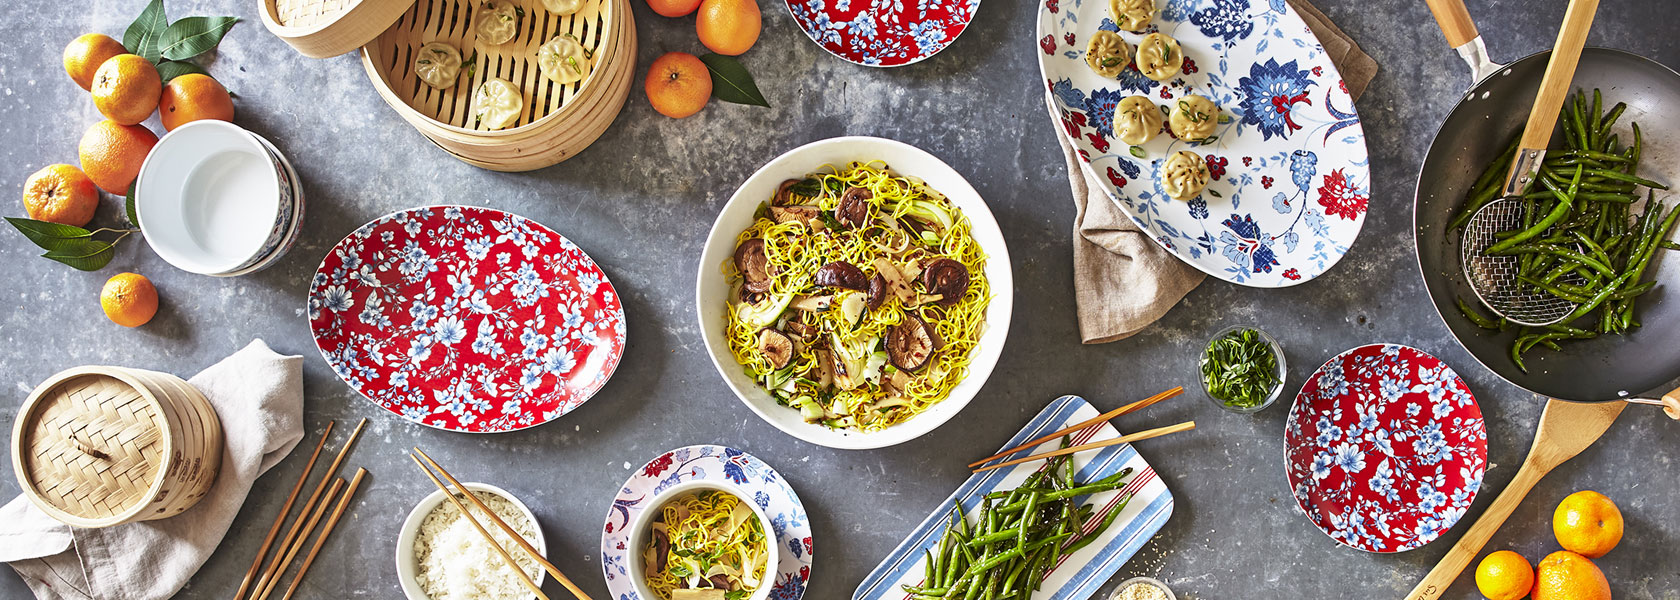 Lunar New Year dinnerware and platters